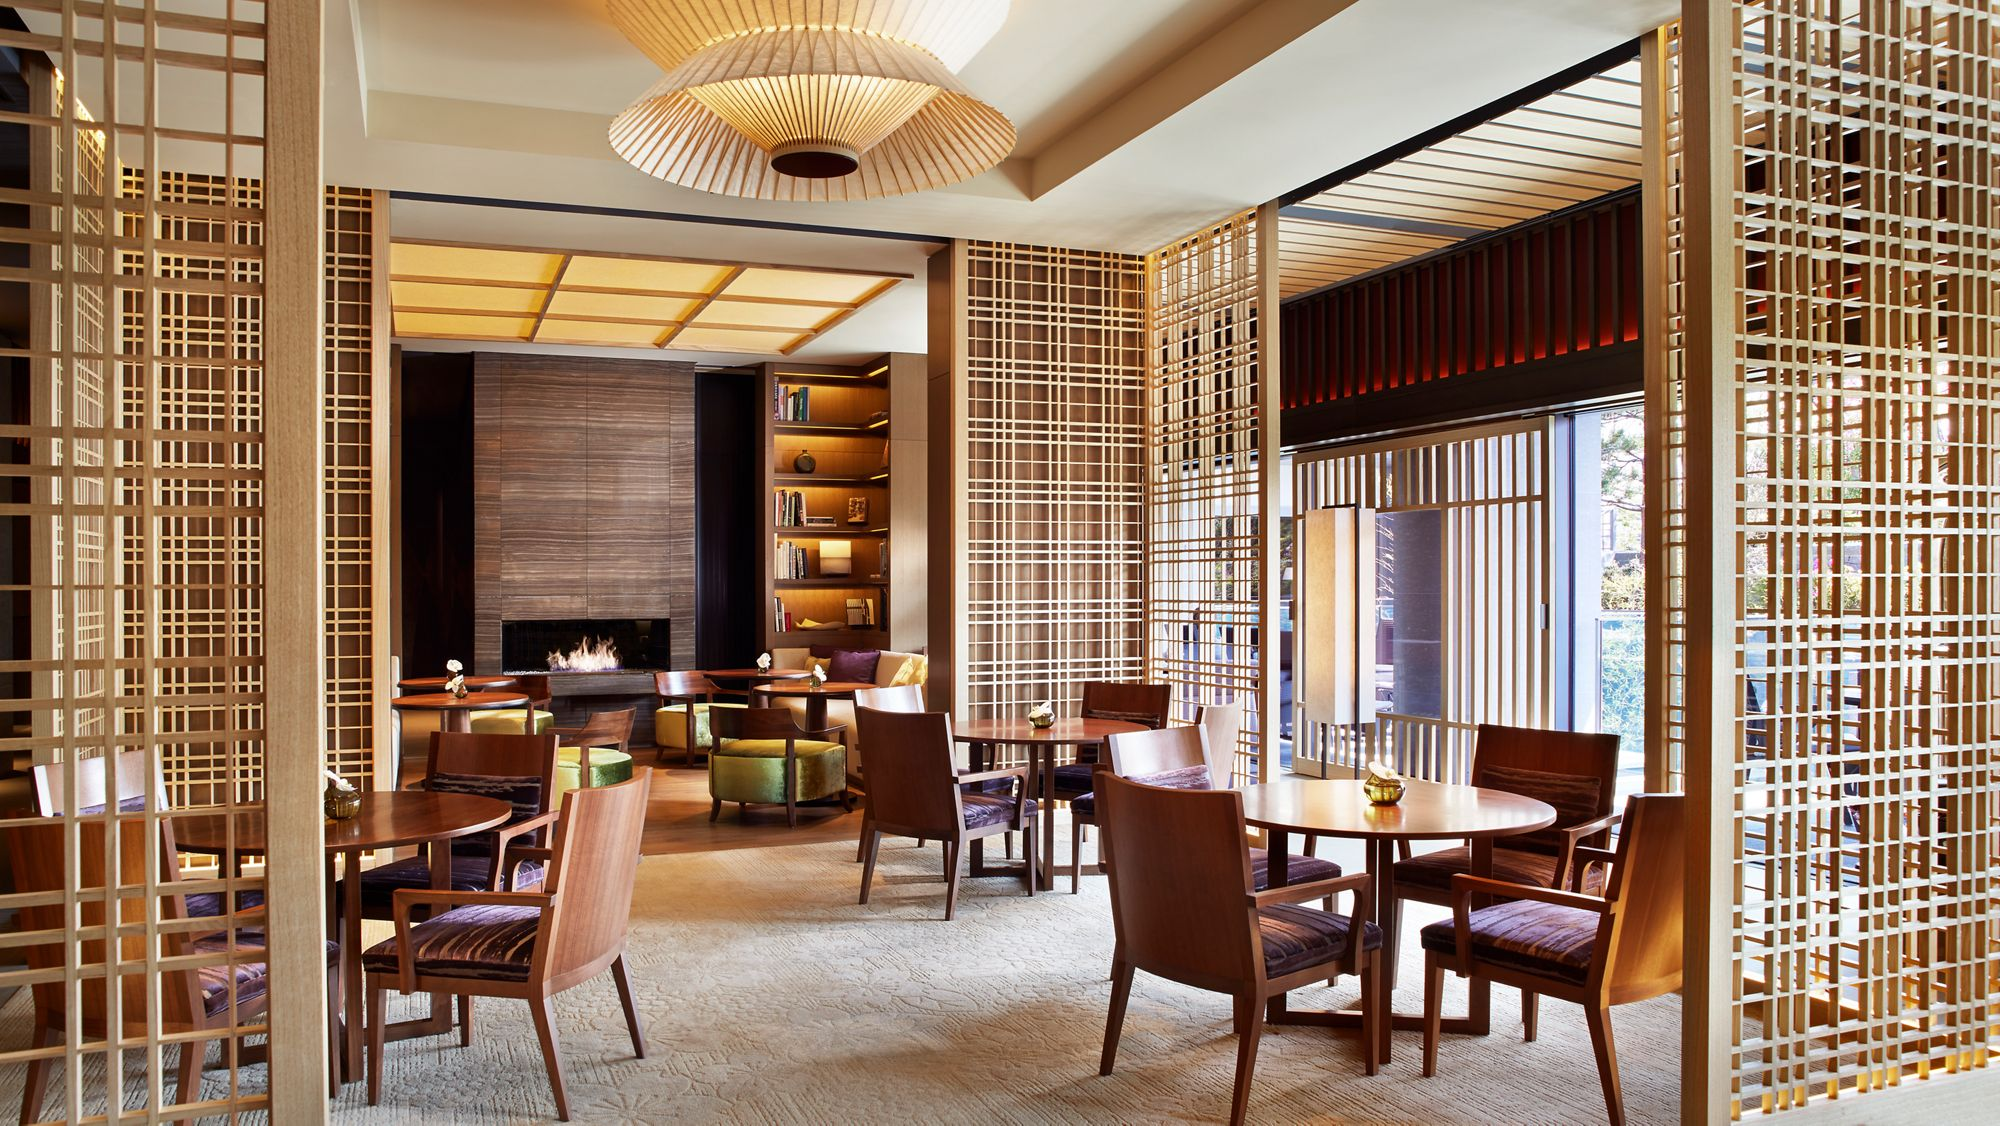 Fantastic Designing A Ritz Carlton Hotel Journey Into The Ritz Carlton Download Free Architecture Designs Crovemadebymaigaardcom